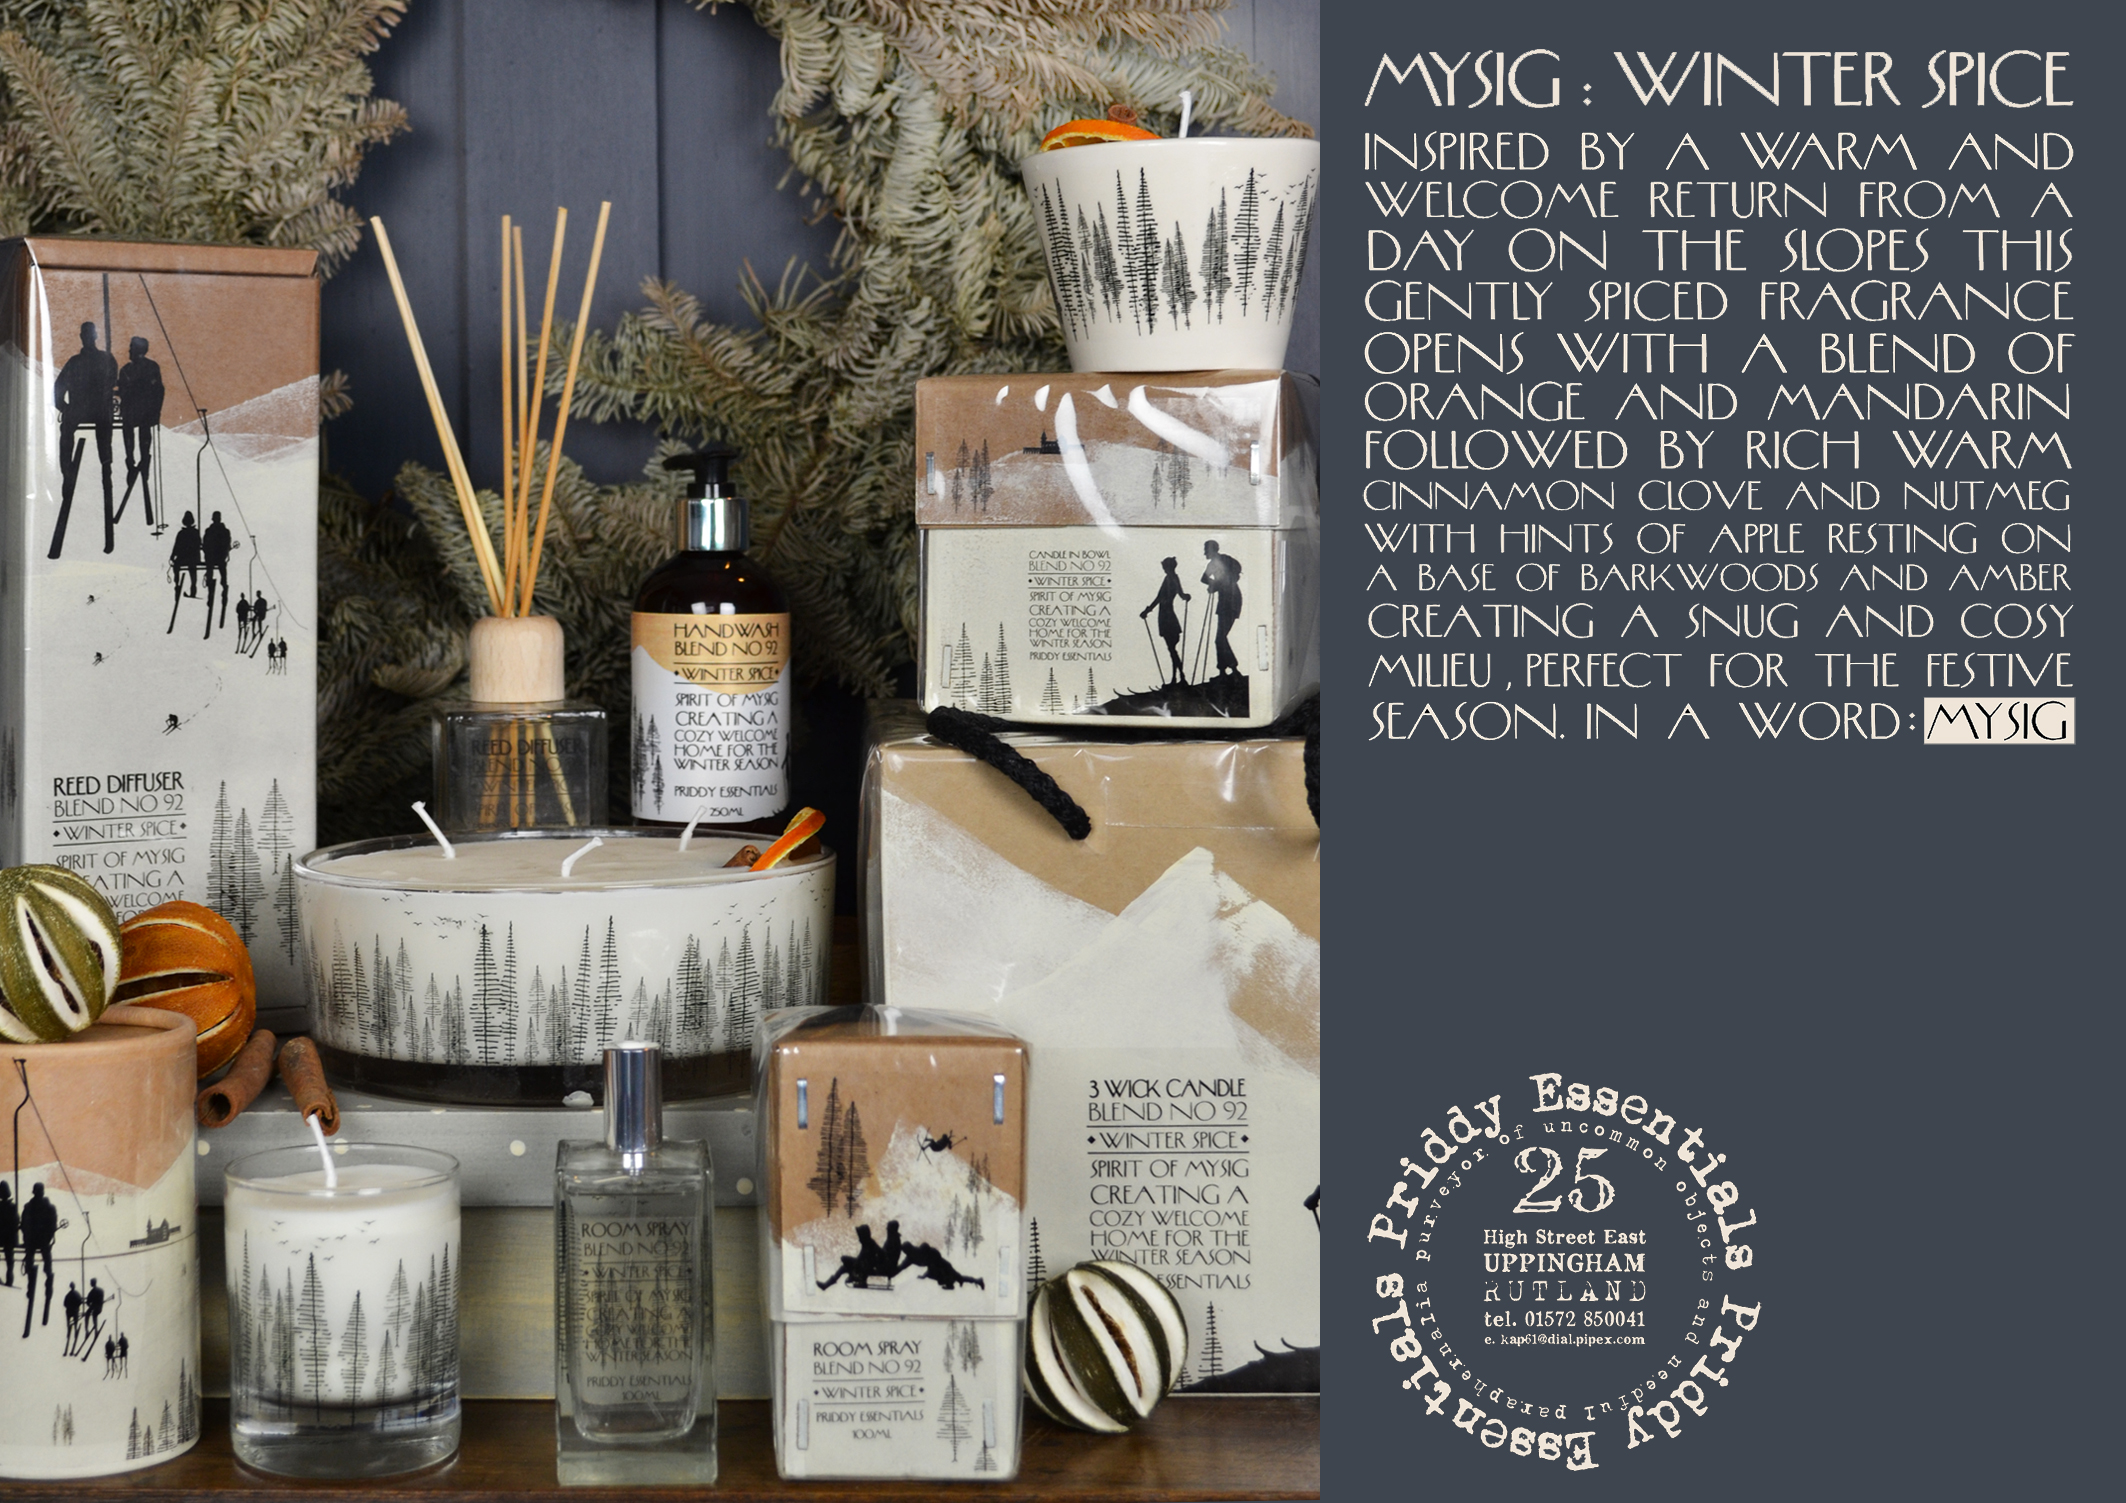 catalogue-page-8a-mysig-intro